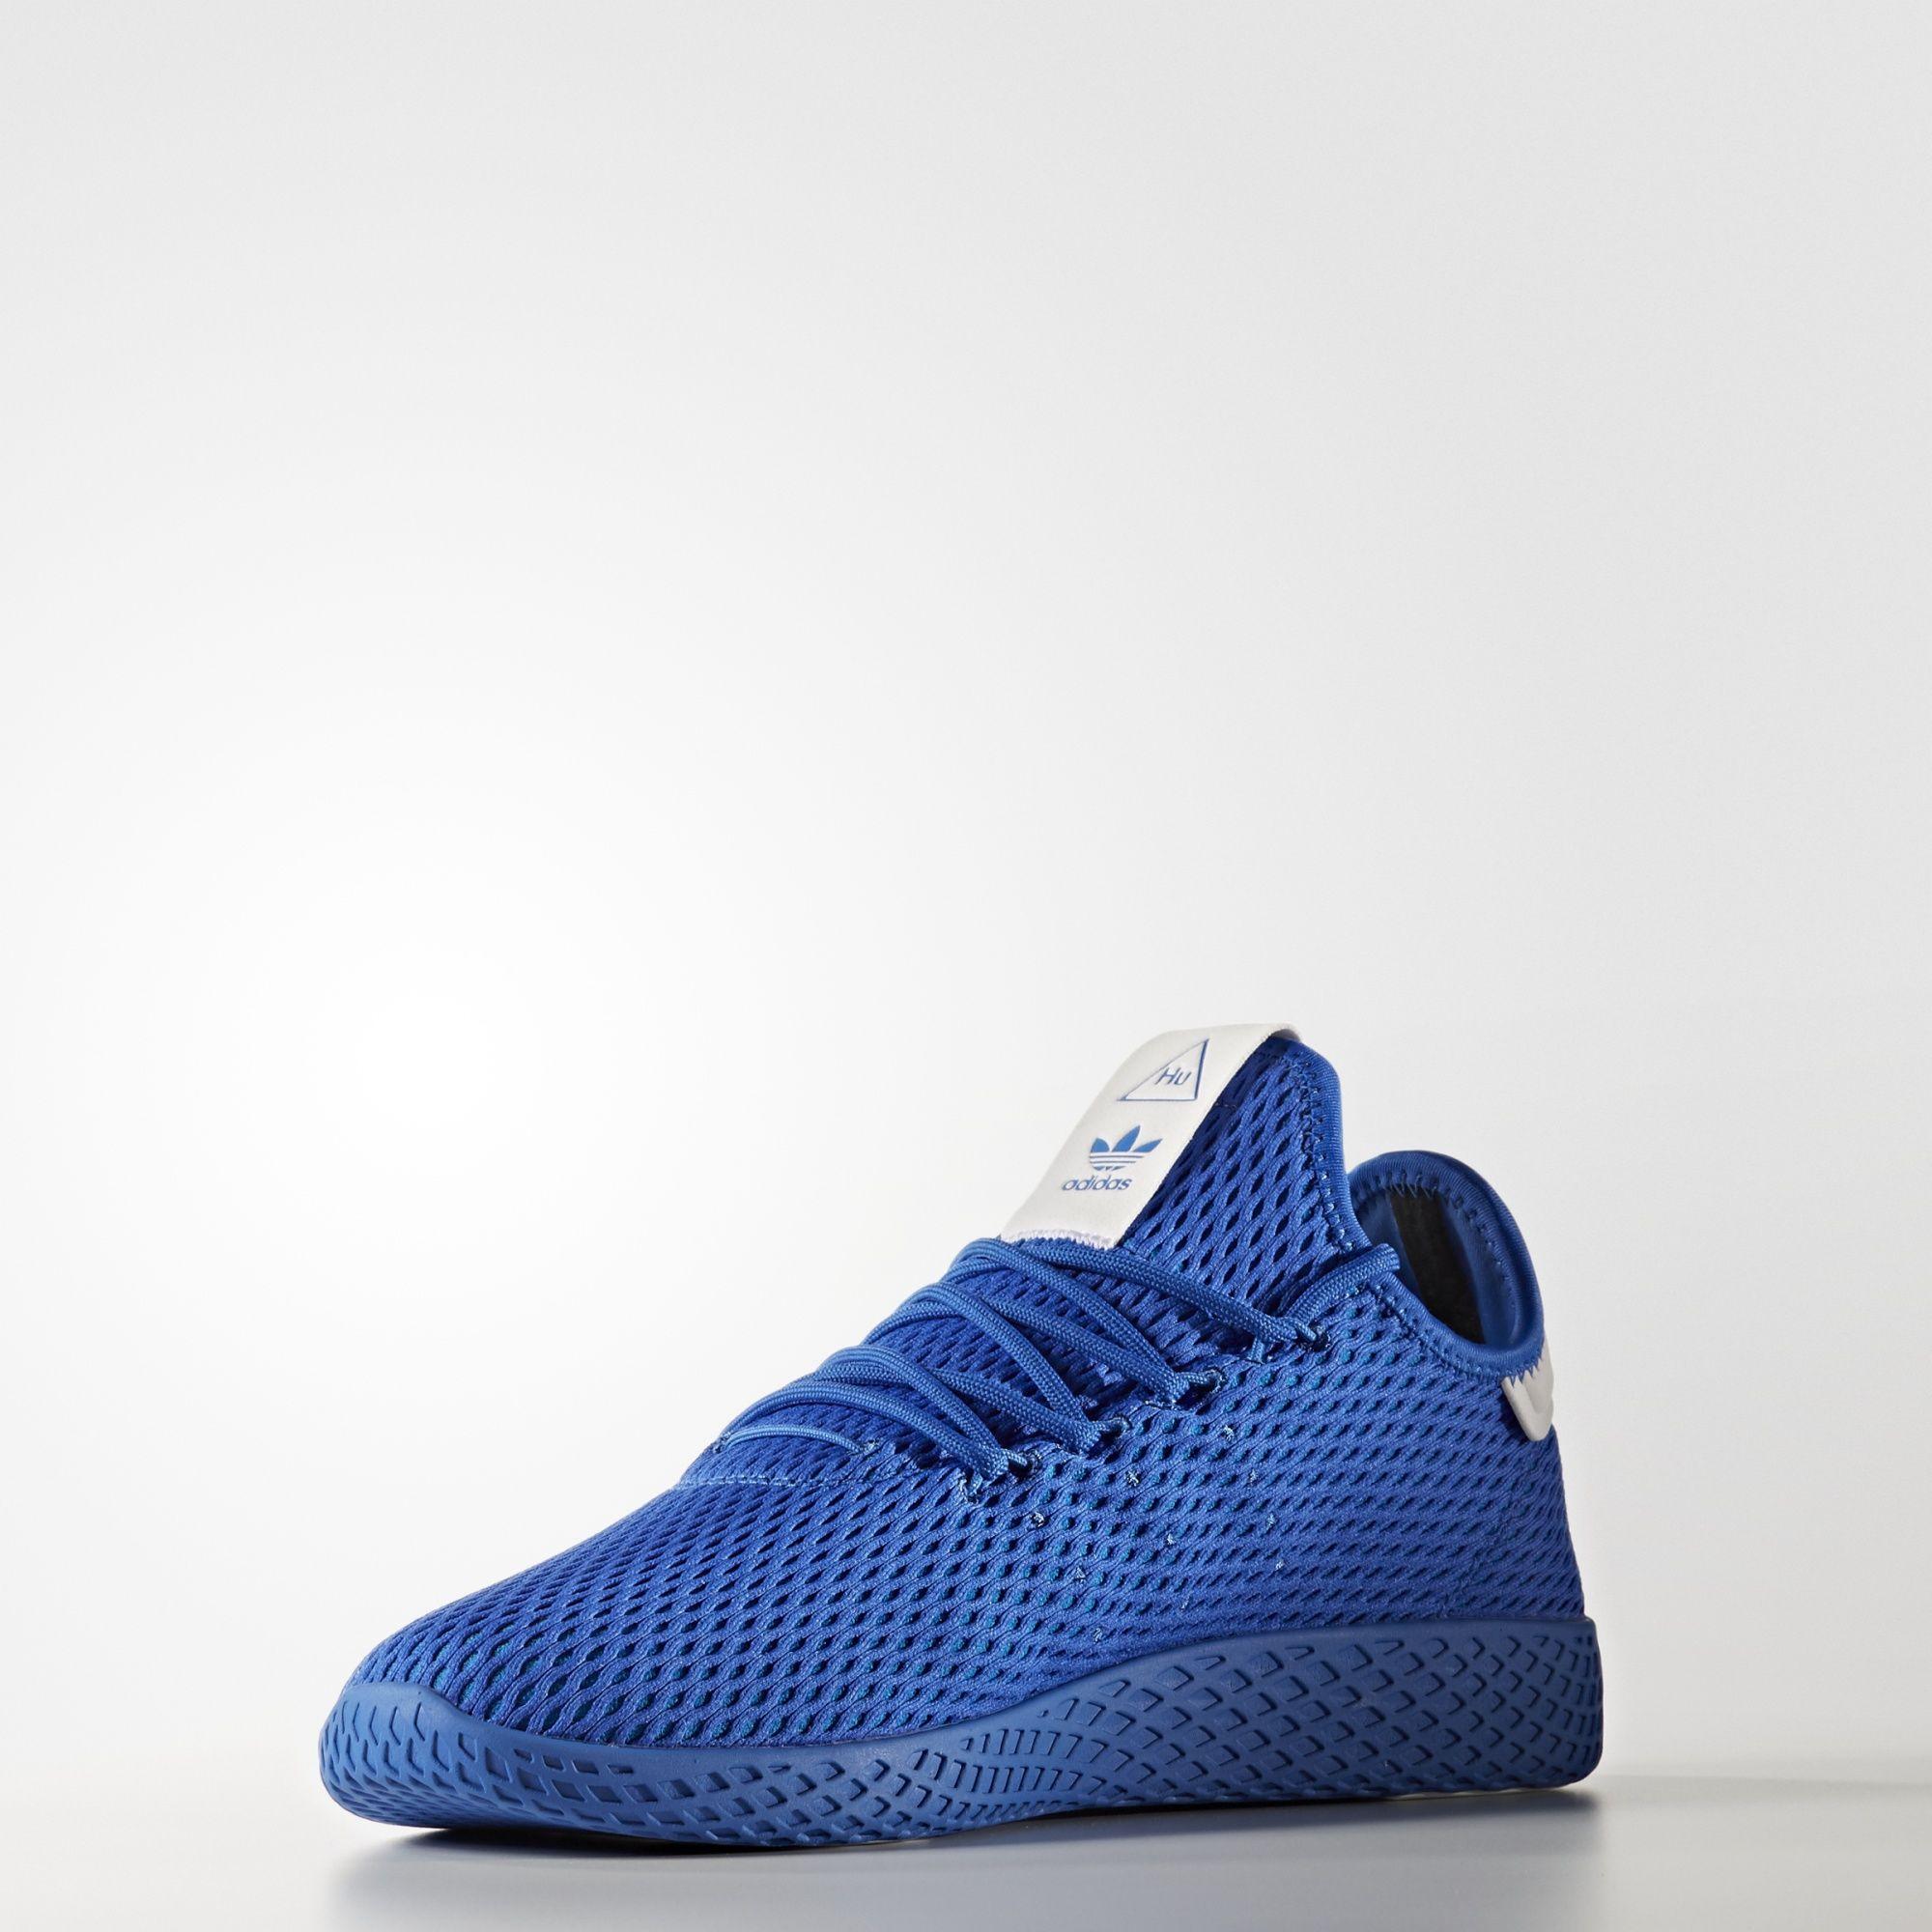 CP9766 Pharrell Williams x adidas Tennis HU Blue 2